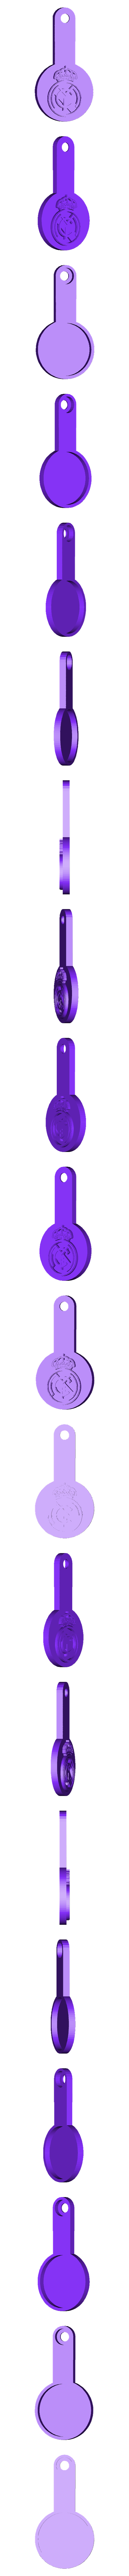 Madrid_Hembra__Slim.stl Télécharger fichier STL gratuit LLAVERO CELTA DE VIGO, REAL MADRID, BARCELONA, ATLETICO DE MADRID Y TORTUGA (NFC) • Modèle imprimable en 3D, celtarra12